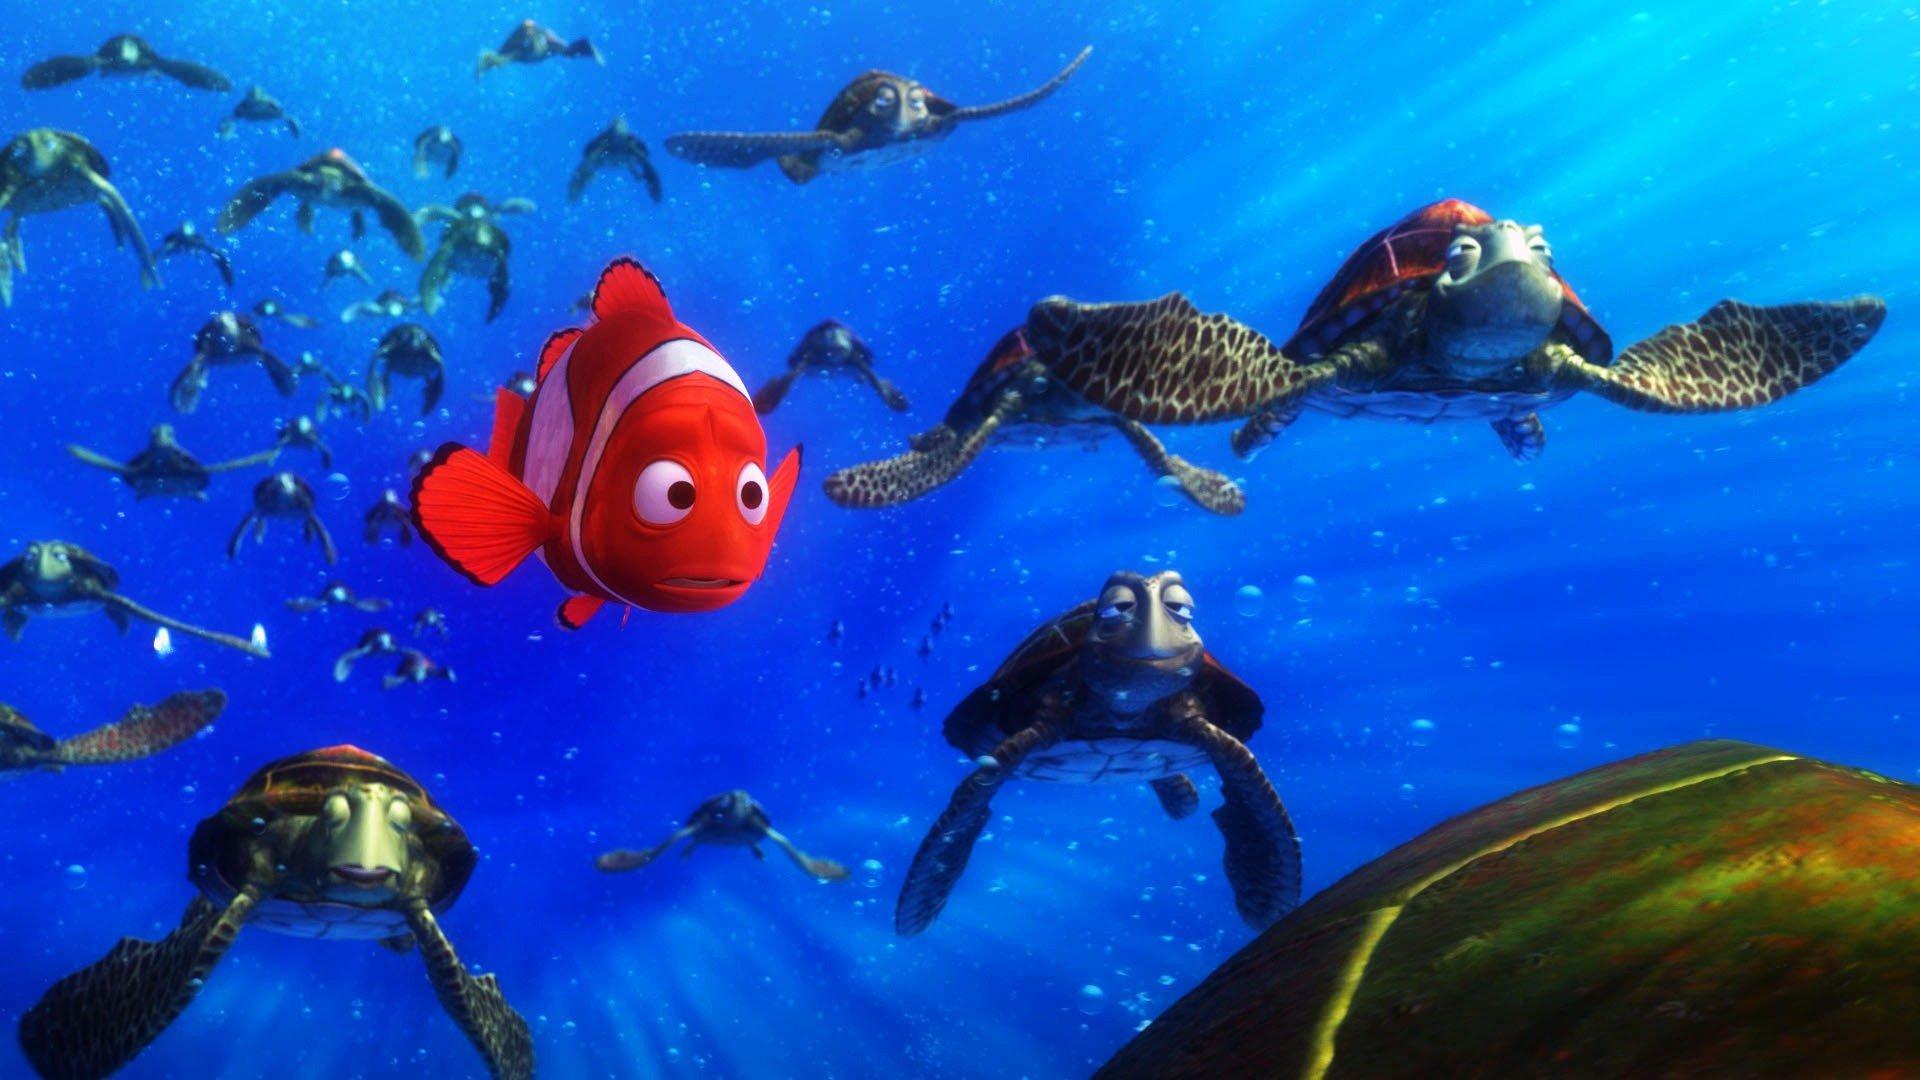 Wallpaper iphone nemo - Finding Nemo Animation Underwater Sea Ocean Tropical Fish Adventure